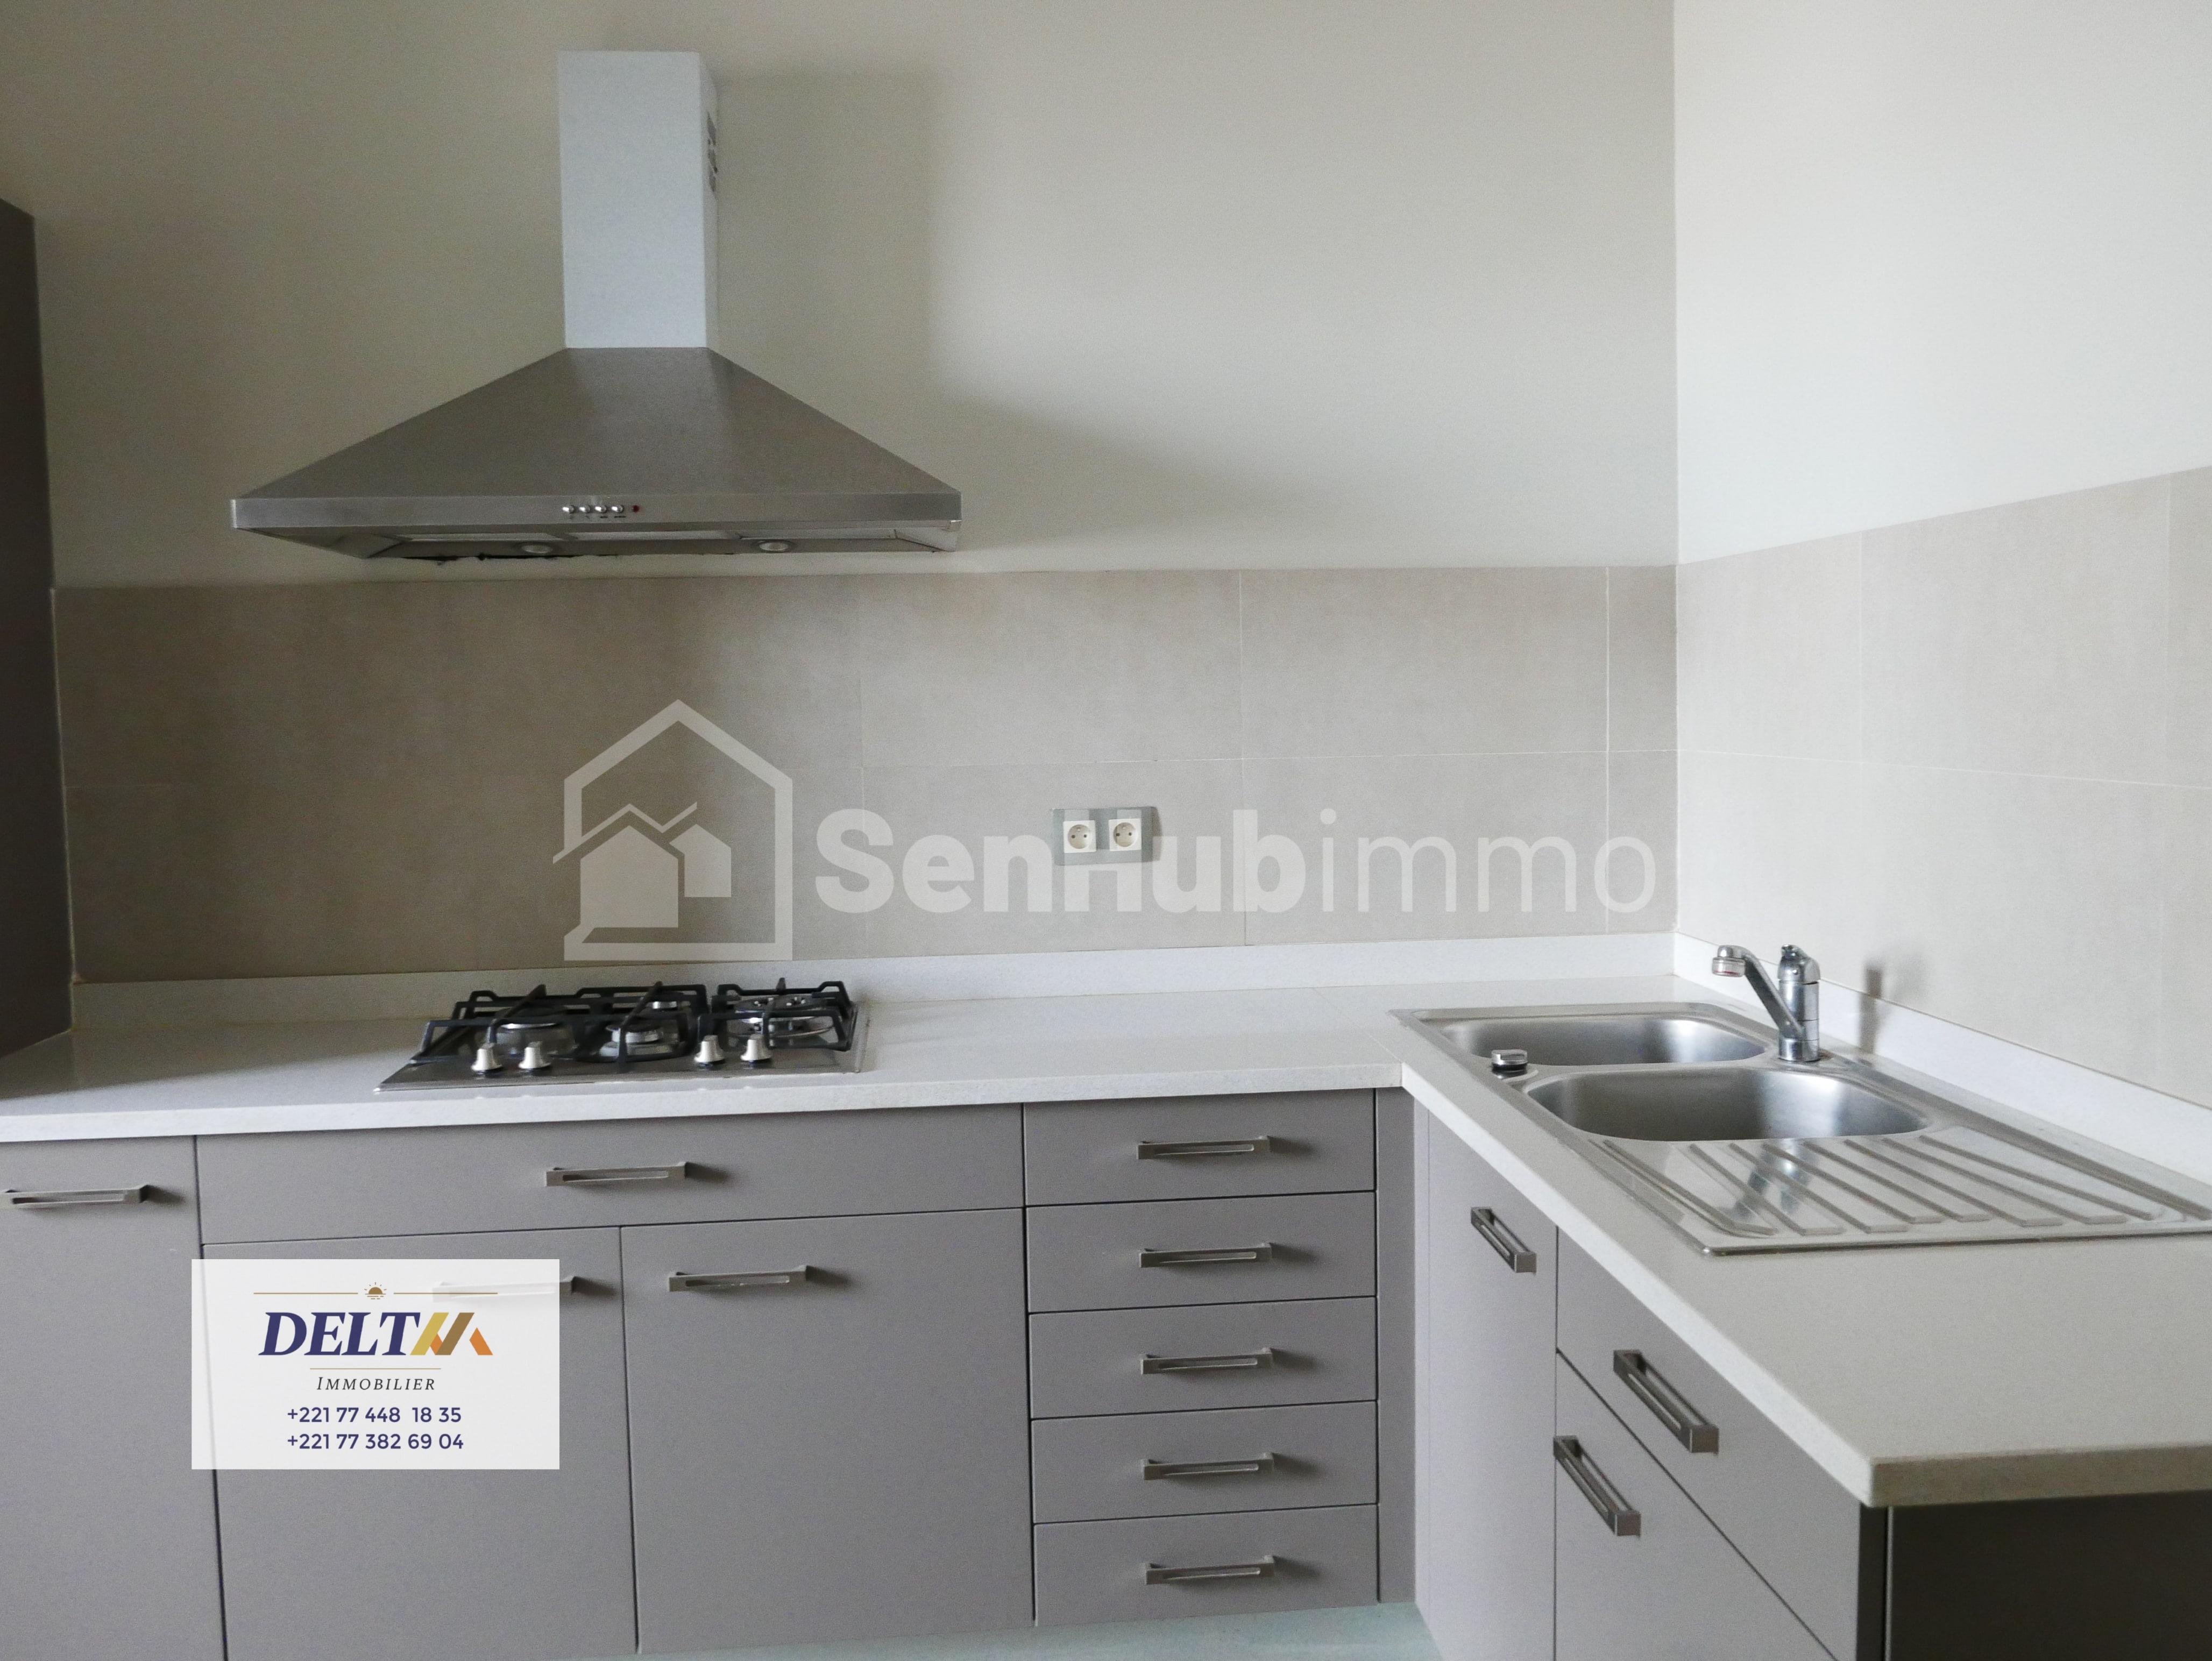 Appartement 3 chambres salon, Mermoz - SenhubImmo.com